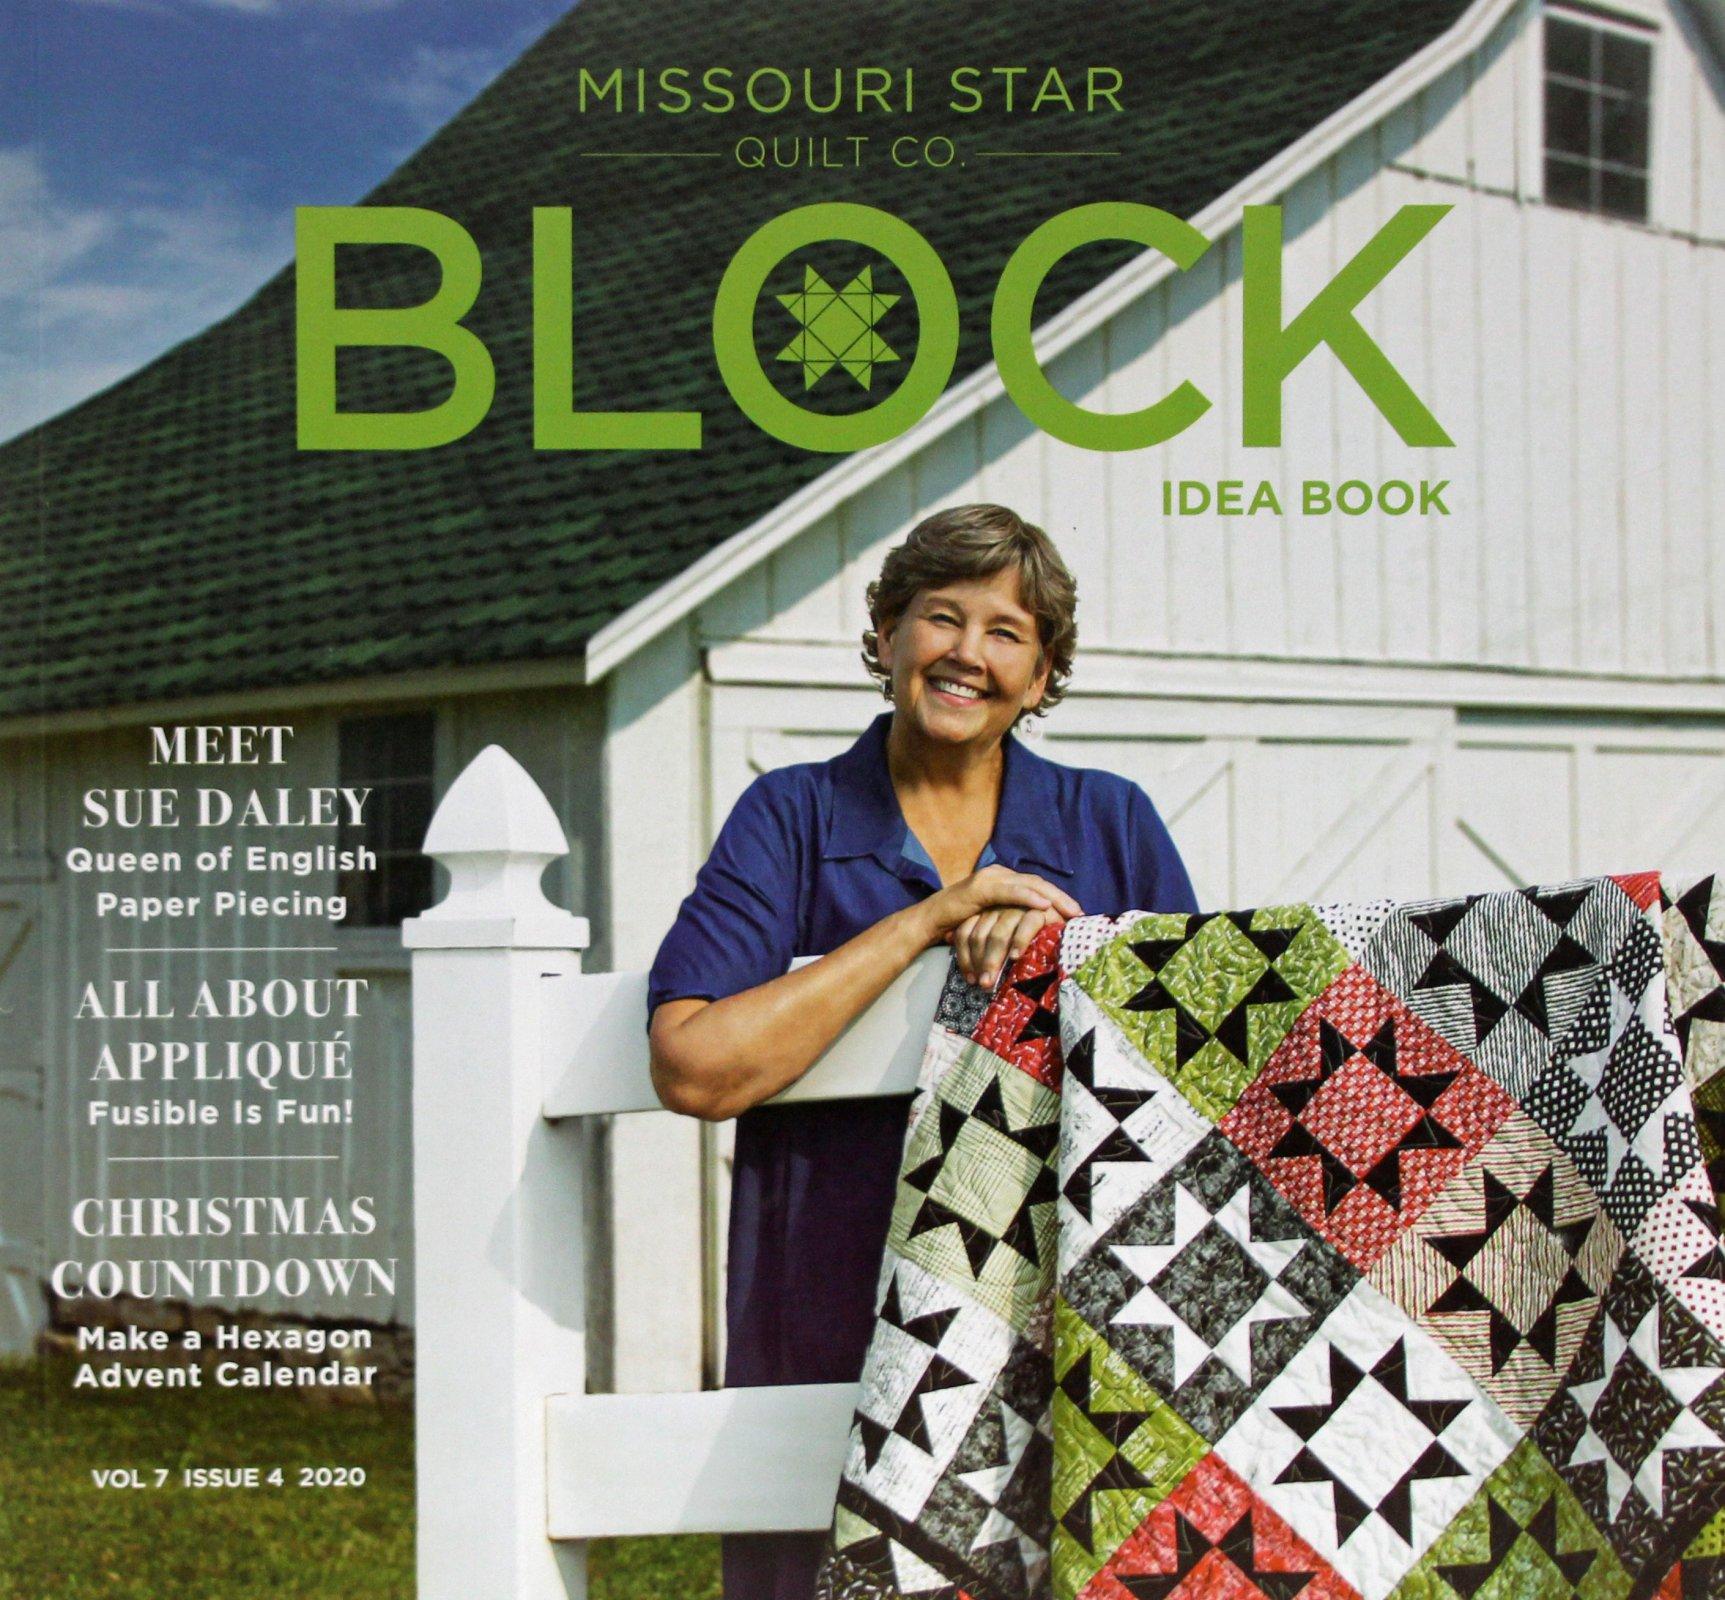 Block Idea Book, vol. 7, issue 4 2020